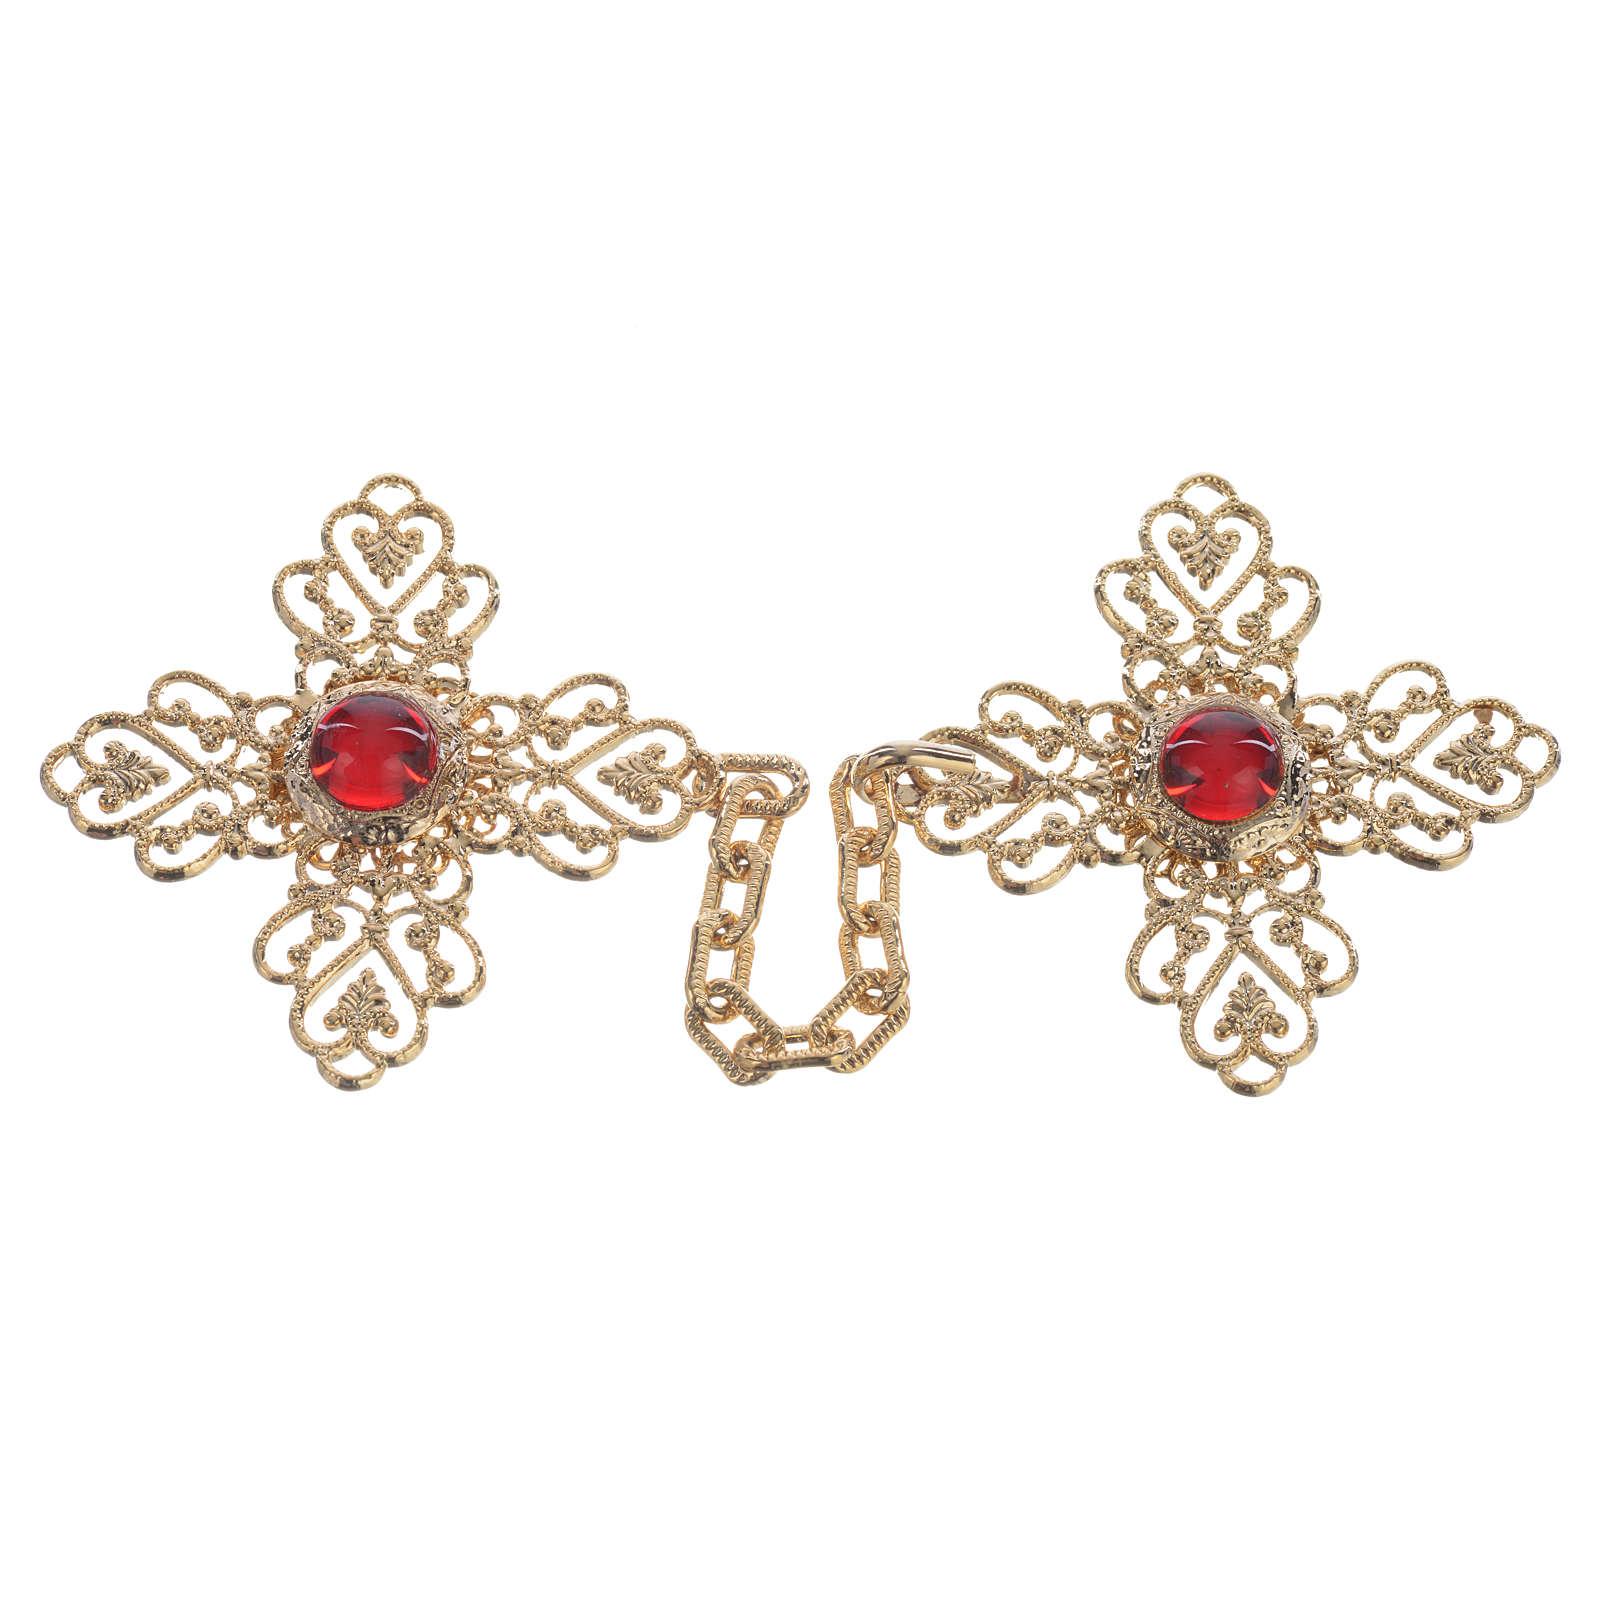 Gancio piviale croce dorata pietre rosse 4